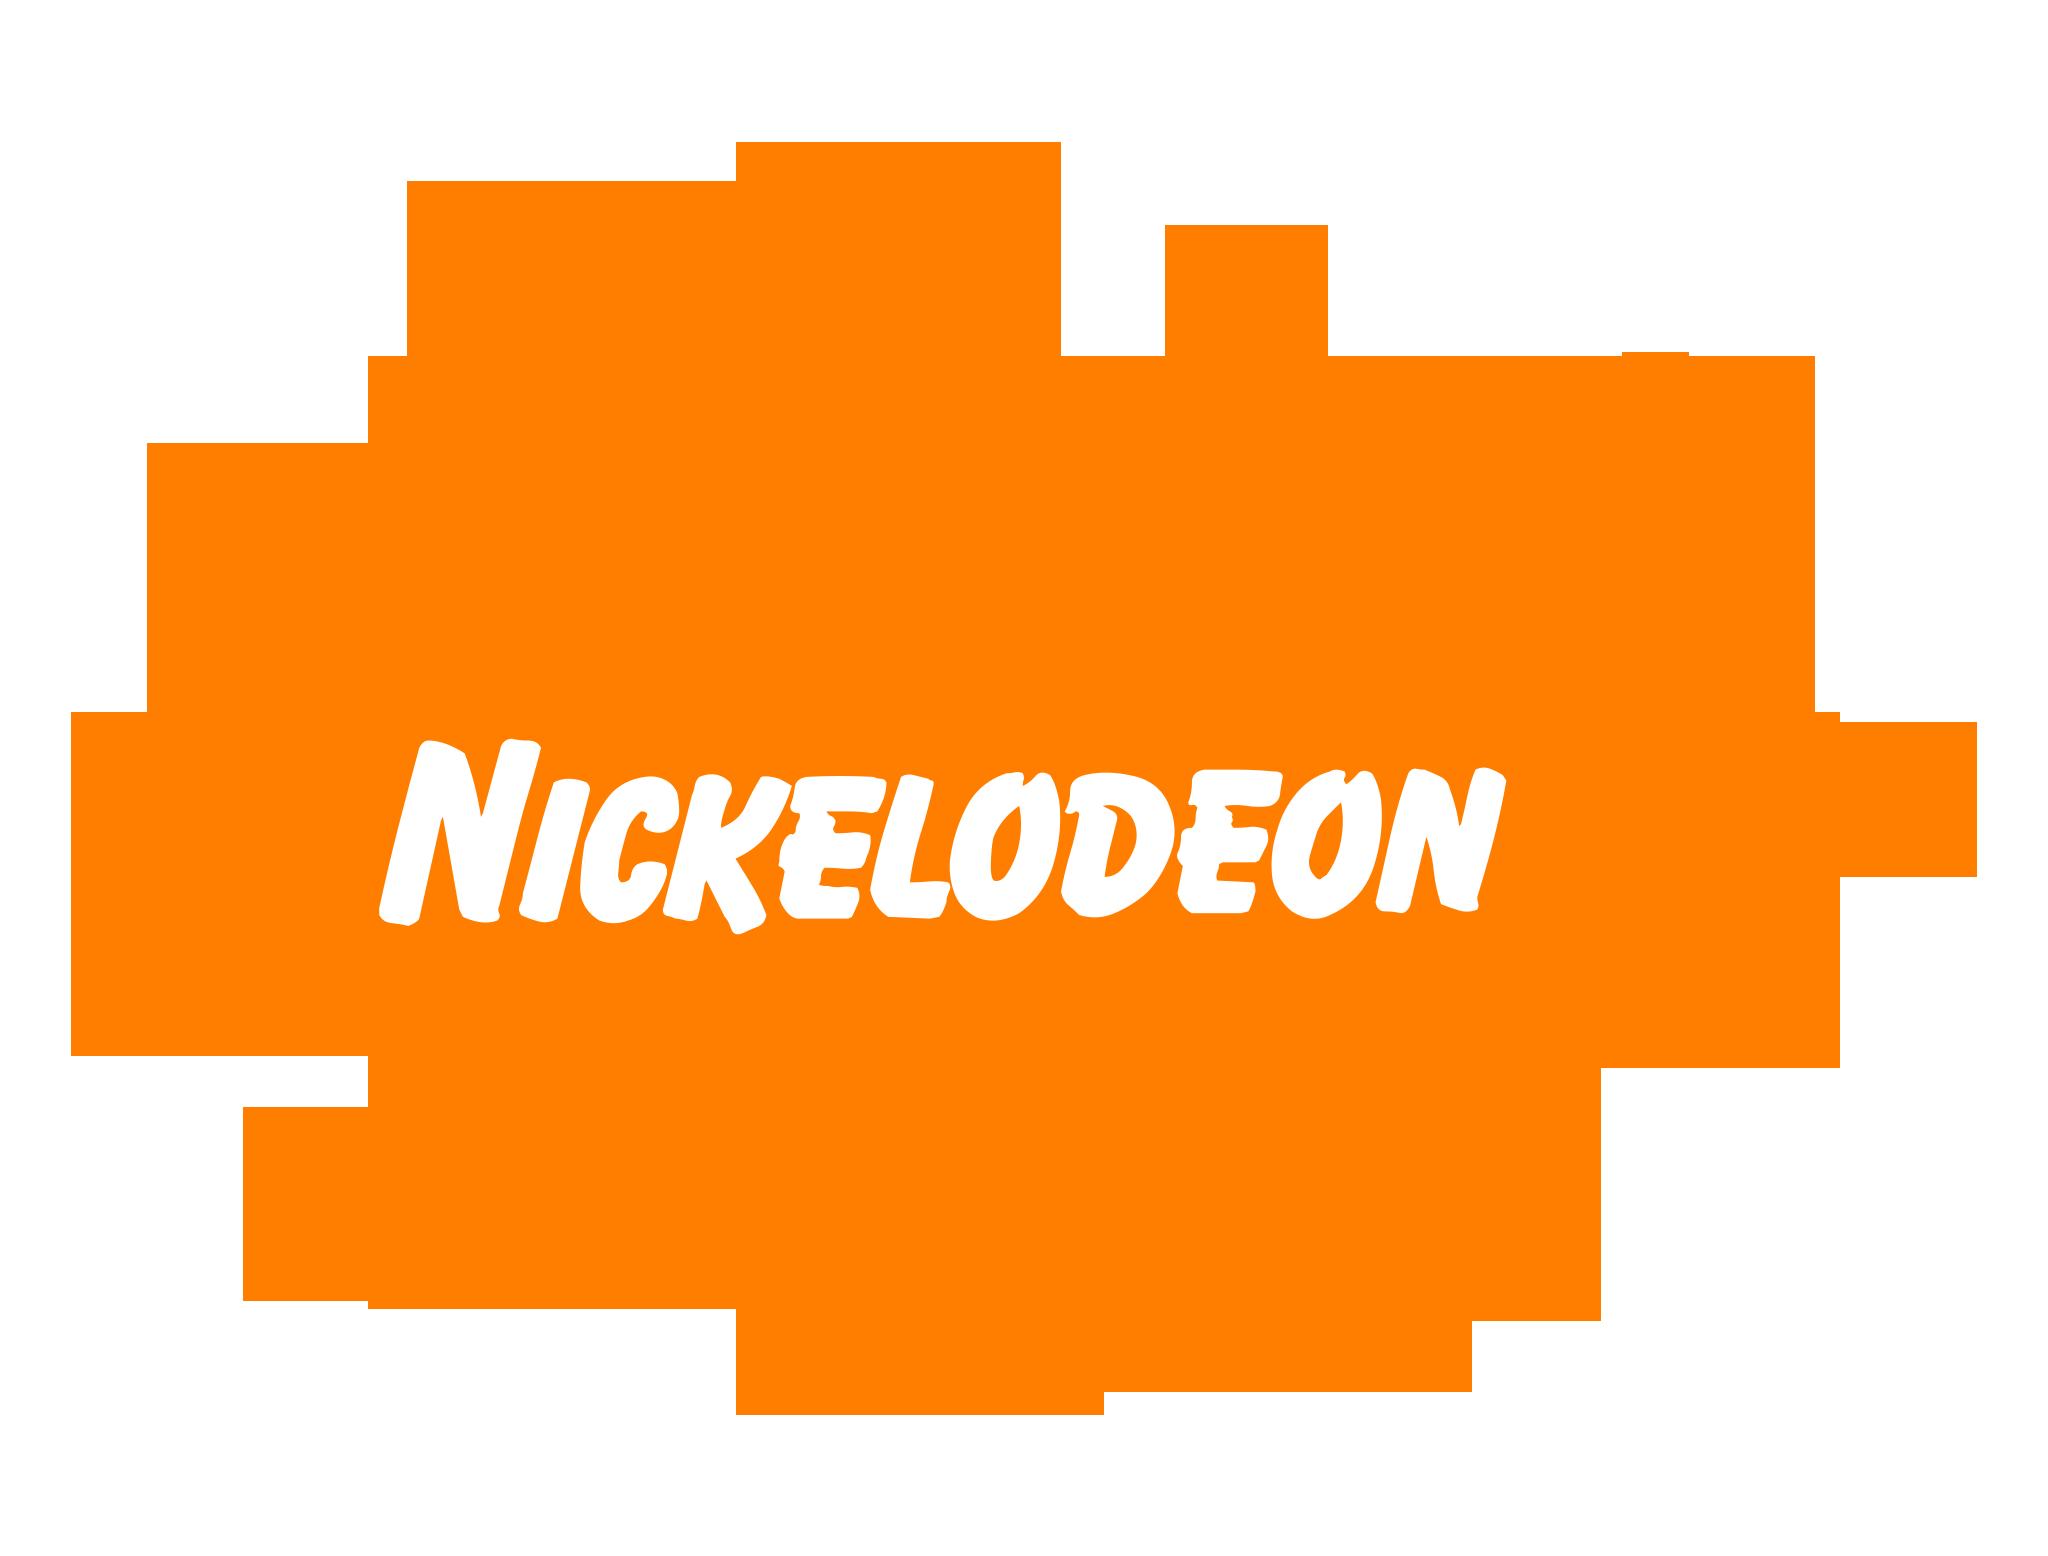 Nickelodeon_01.png